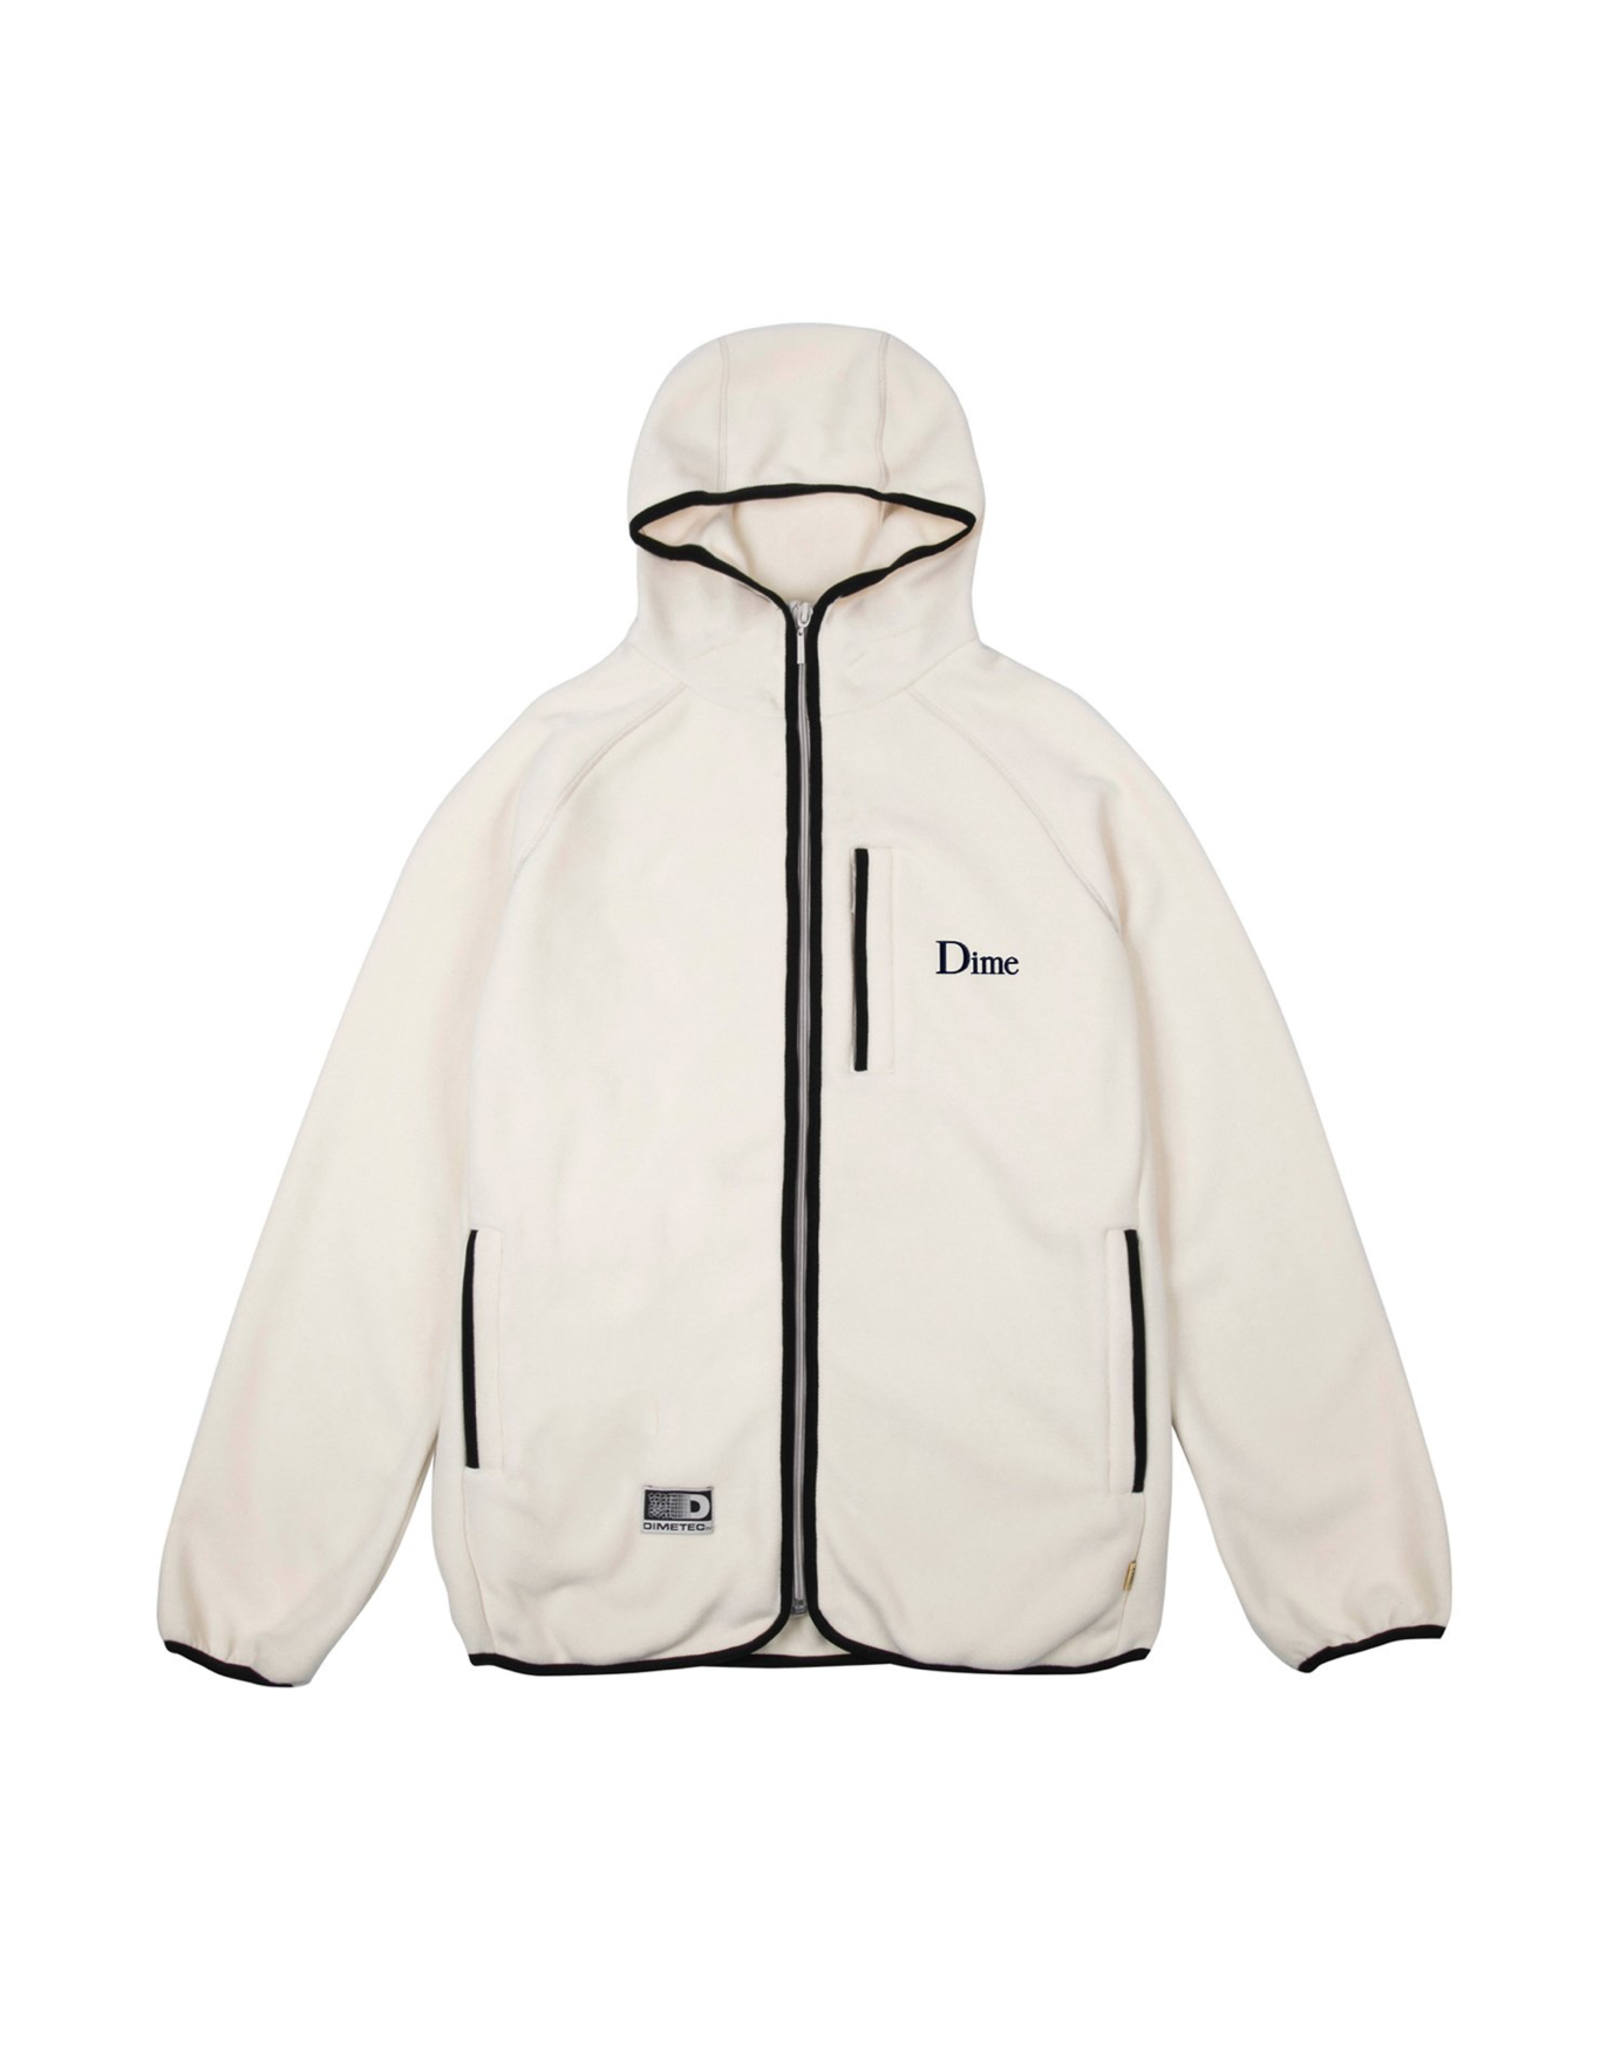 DIME Polar fleece hooded jacket